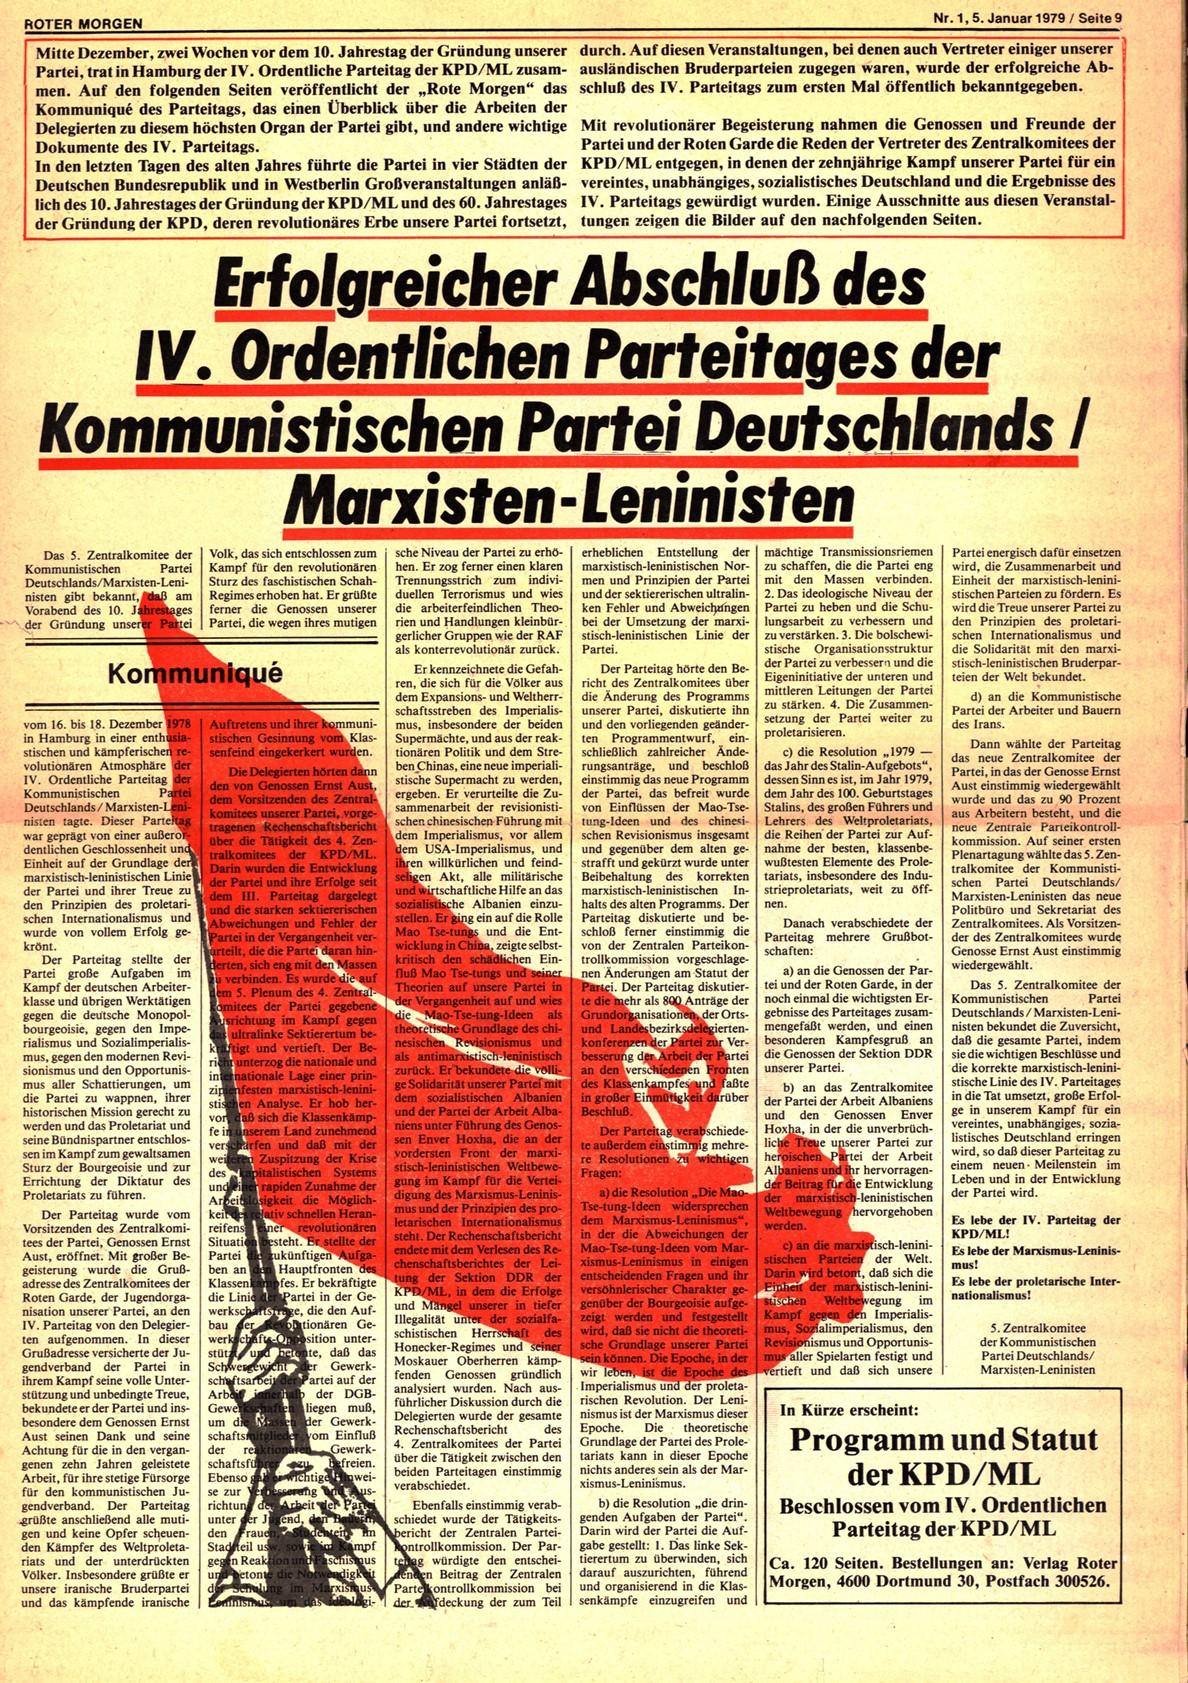 Roter Morgen, 13. Jg., 5. Januar 1979, Nr. 1, Seite 9